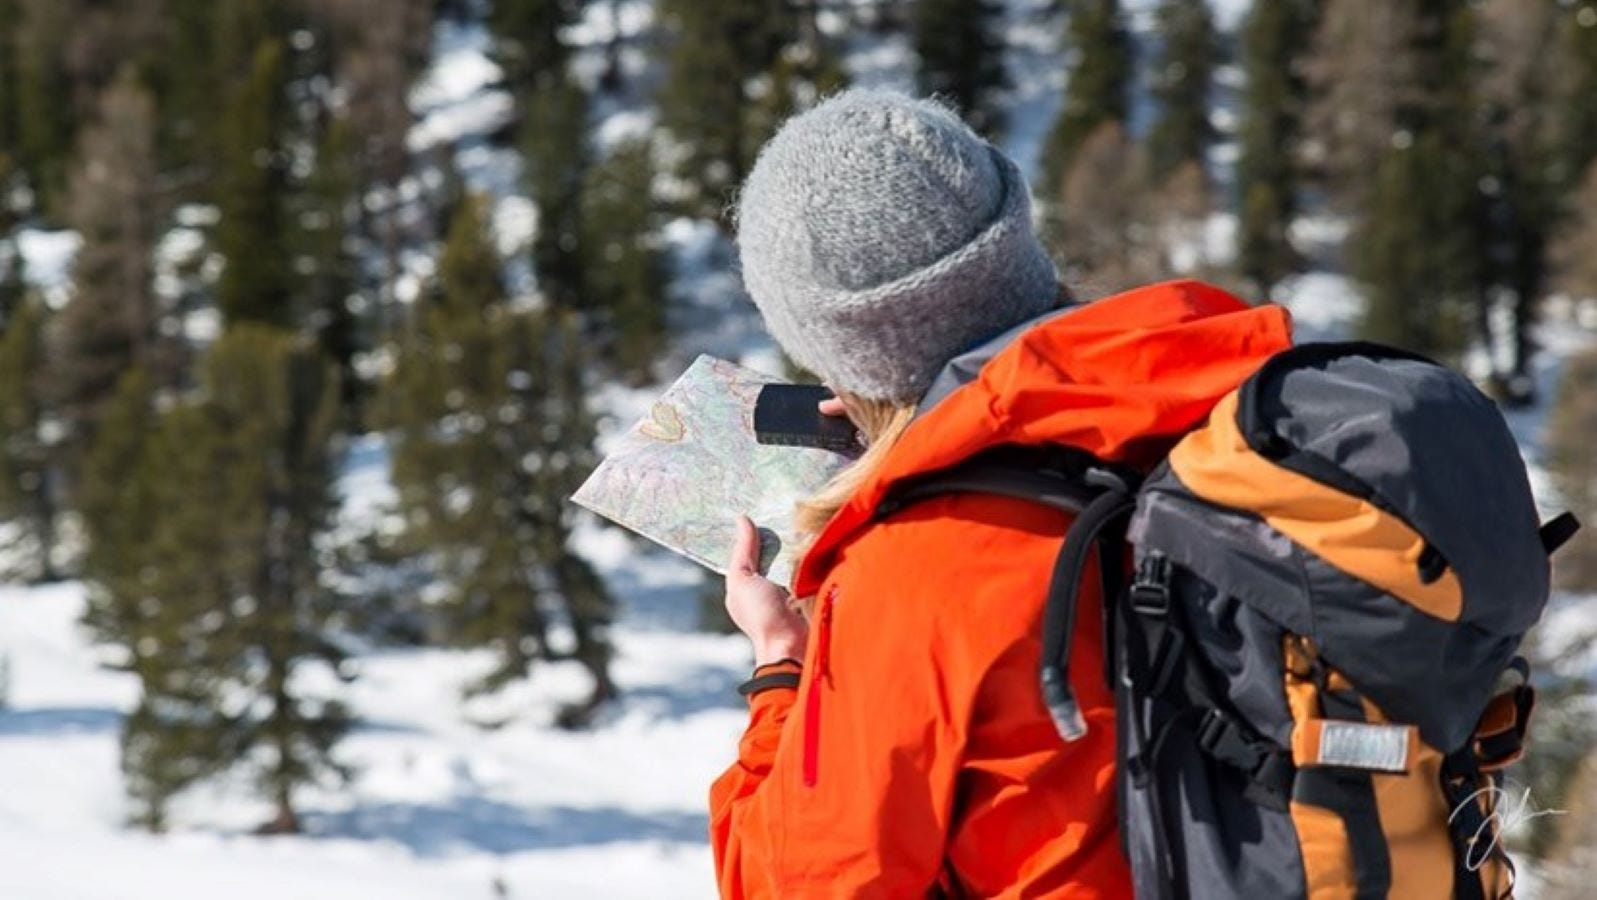 A man on a hike using a Suunto MC-2 compass and a map.